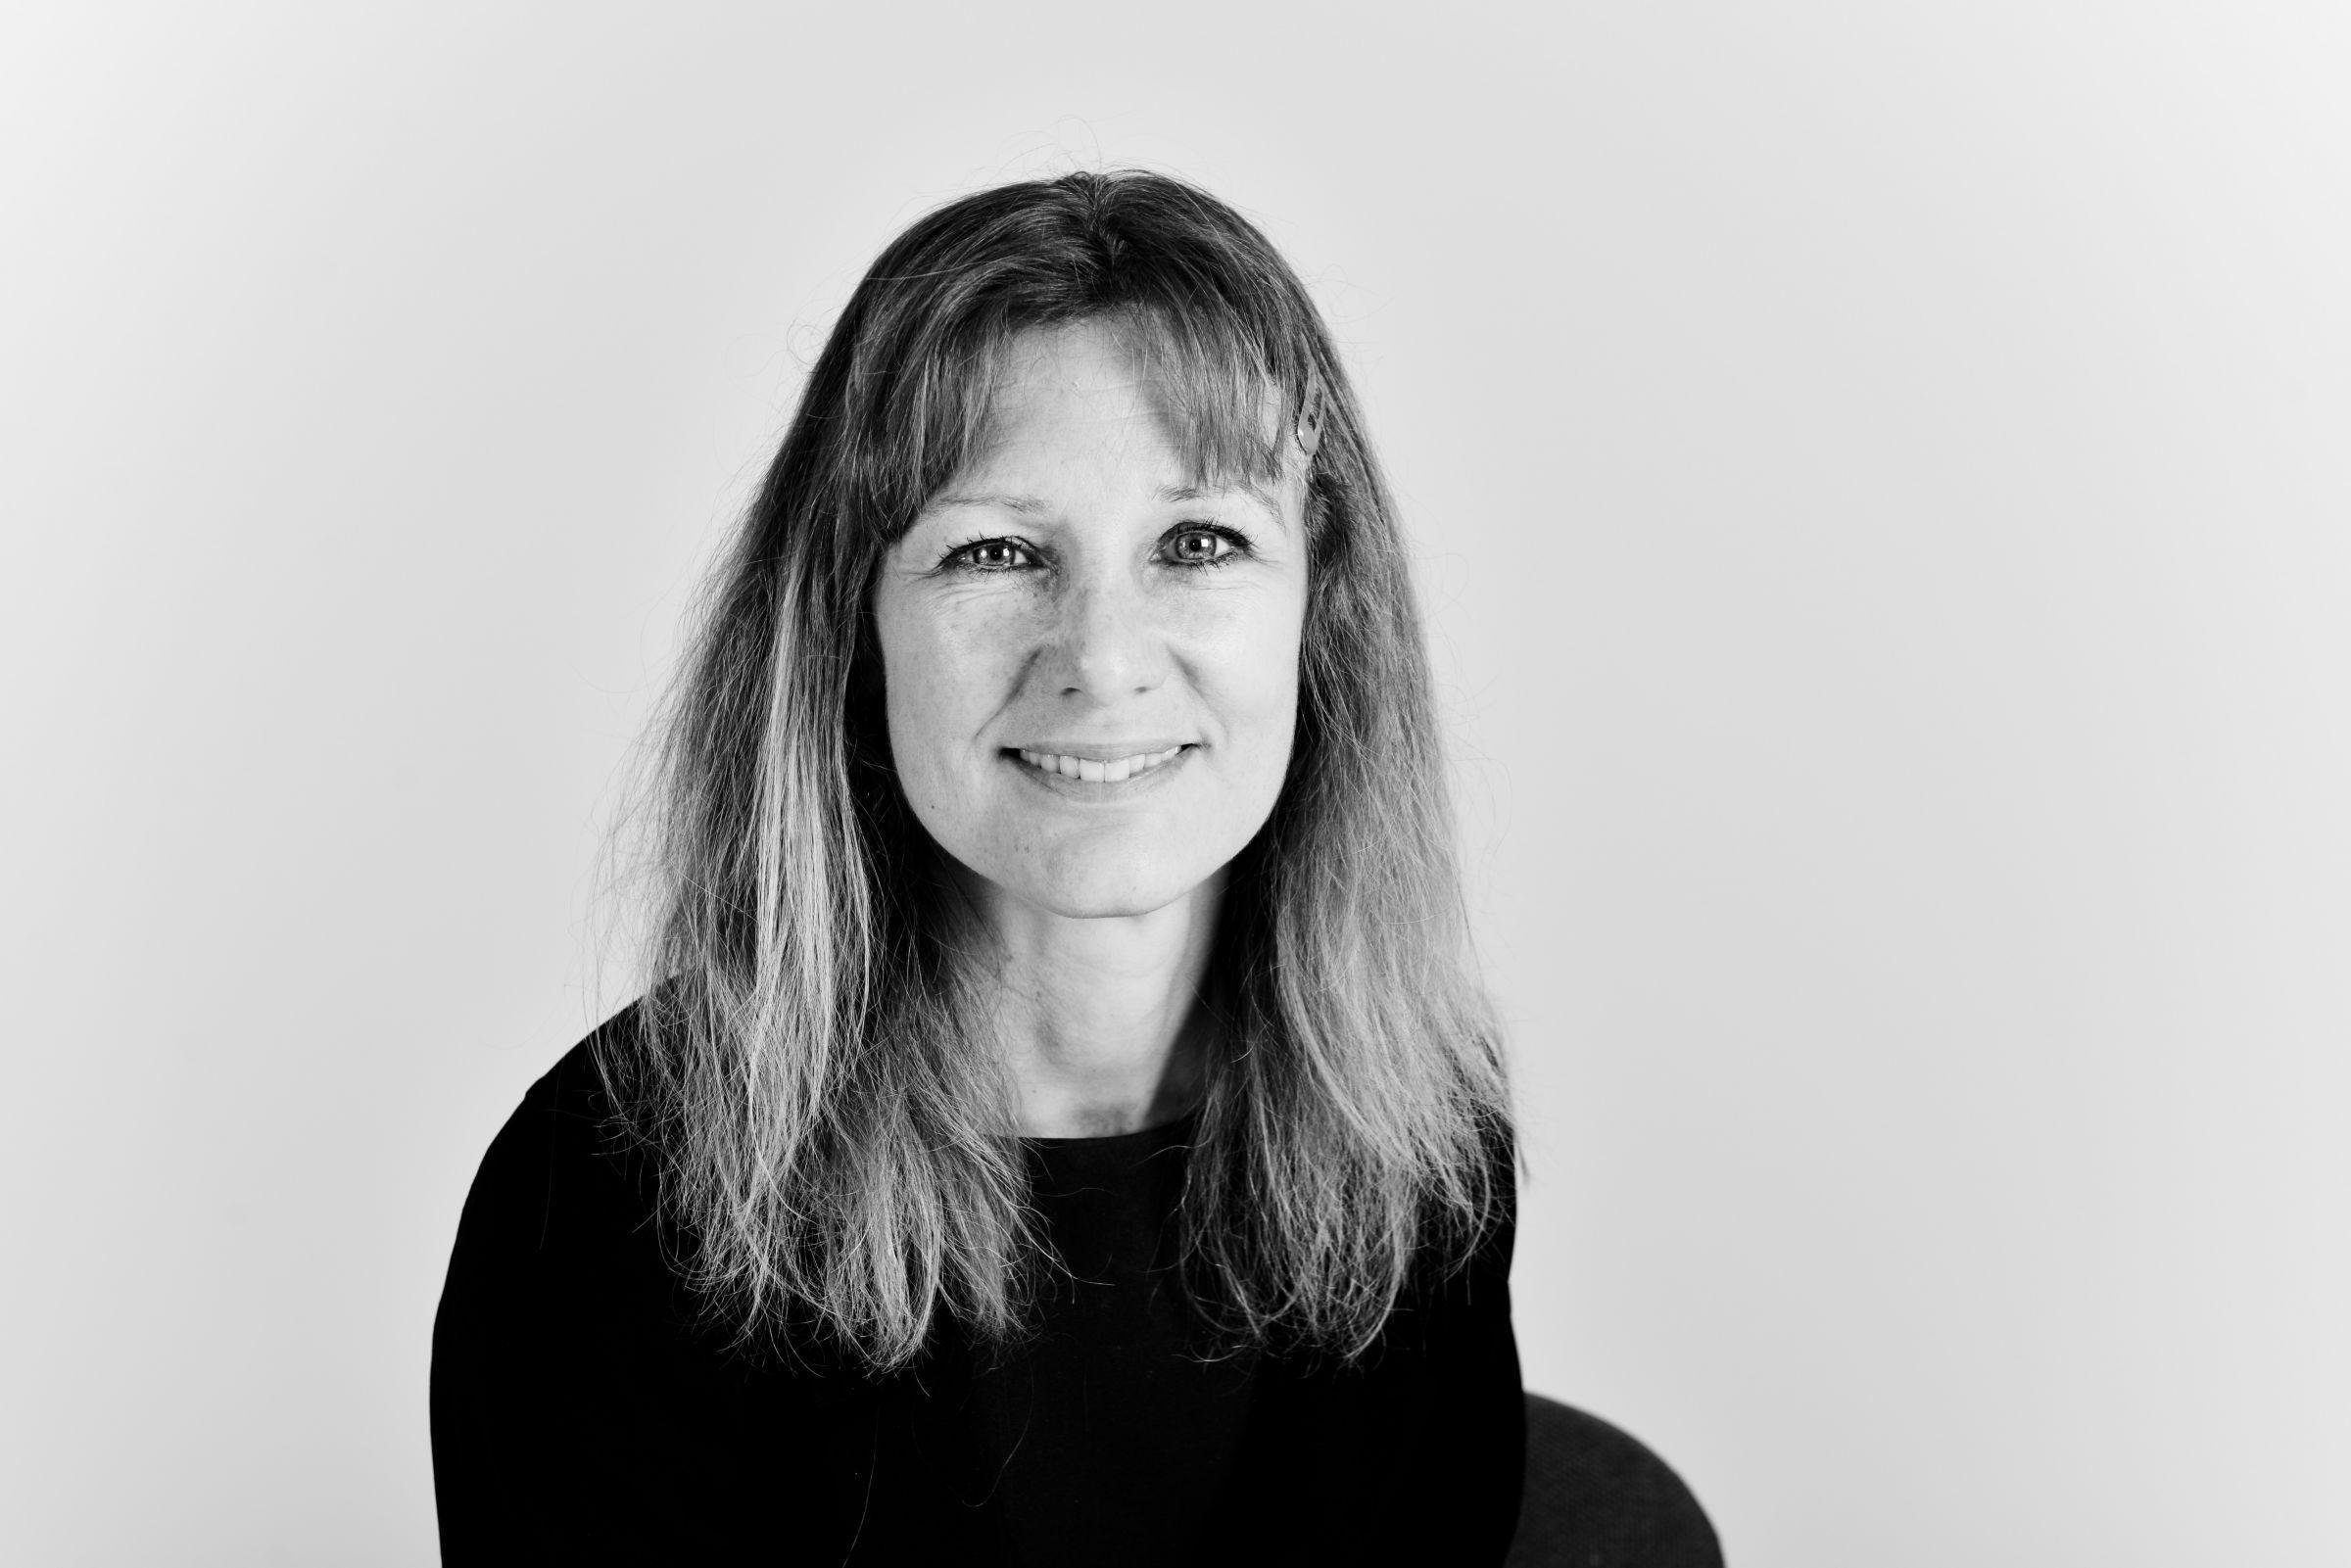 Joanna Gent, Head of Property